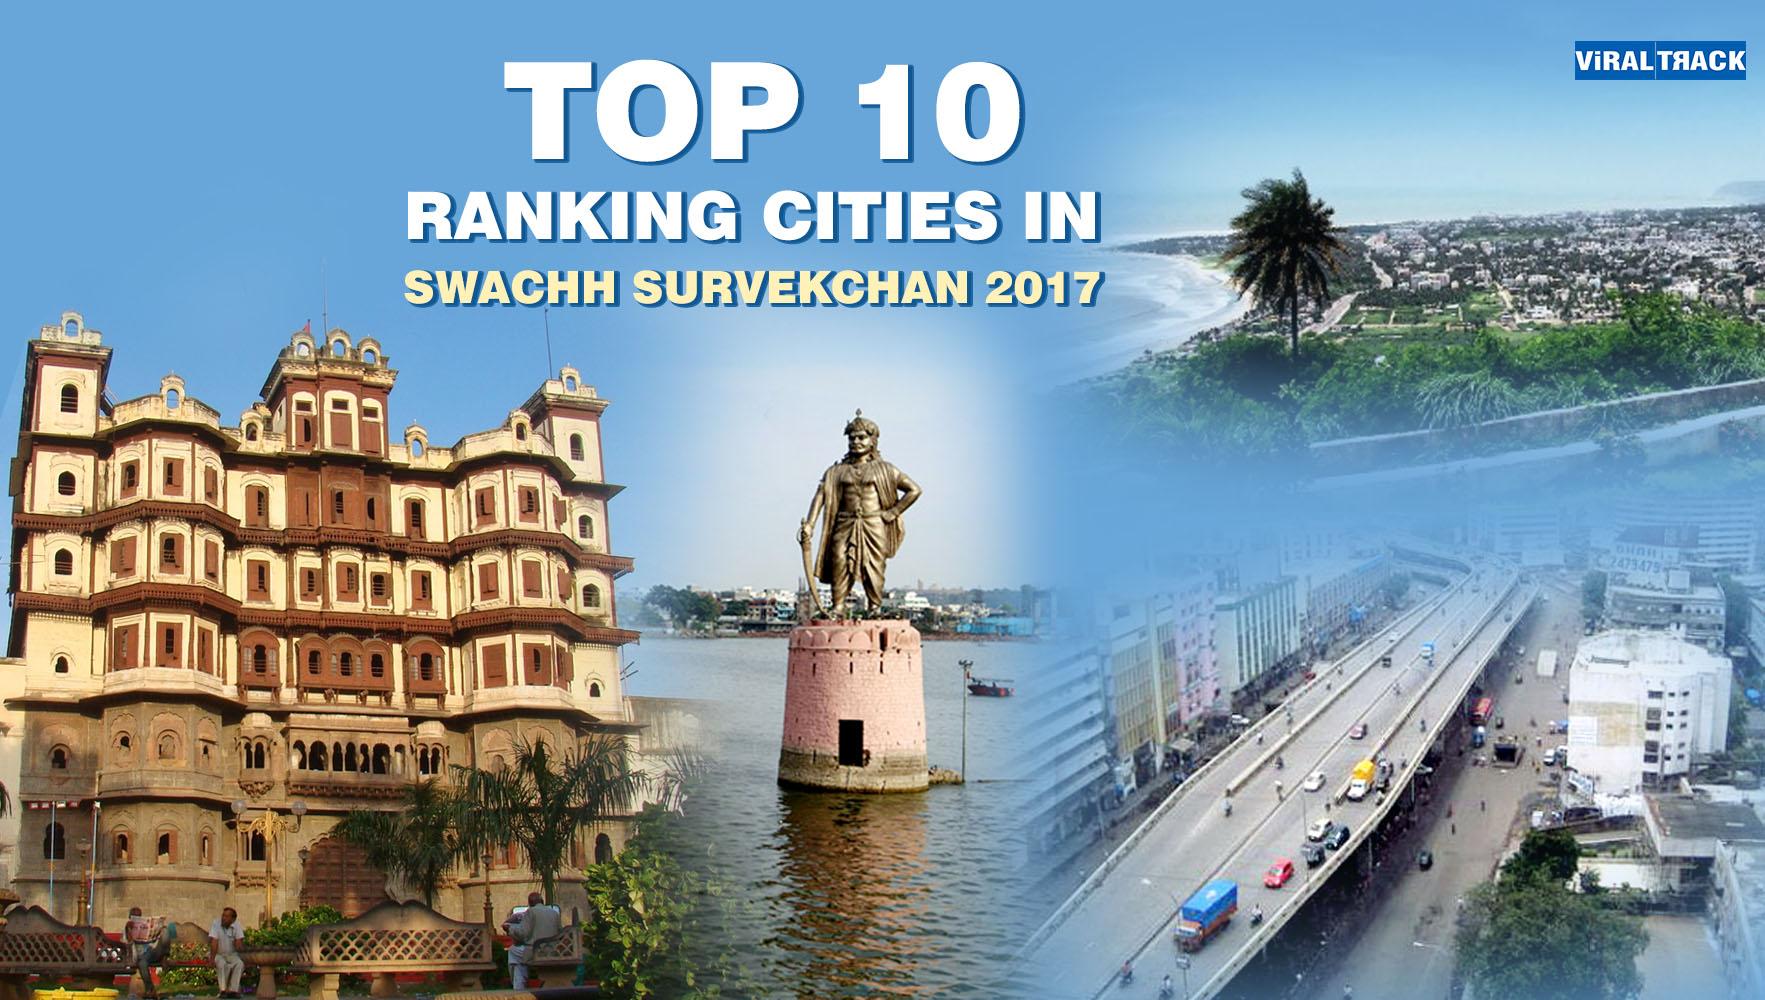 swachh bharat abhiyan Top 10 ranking